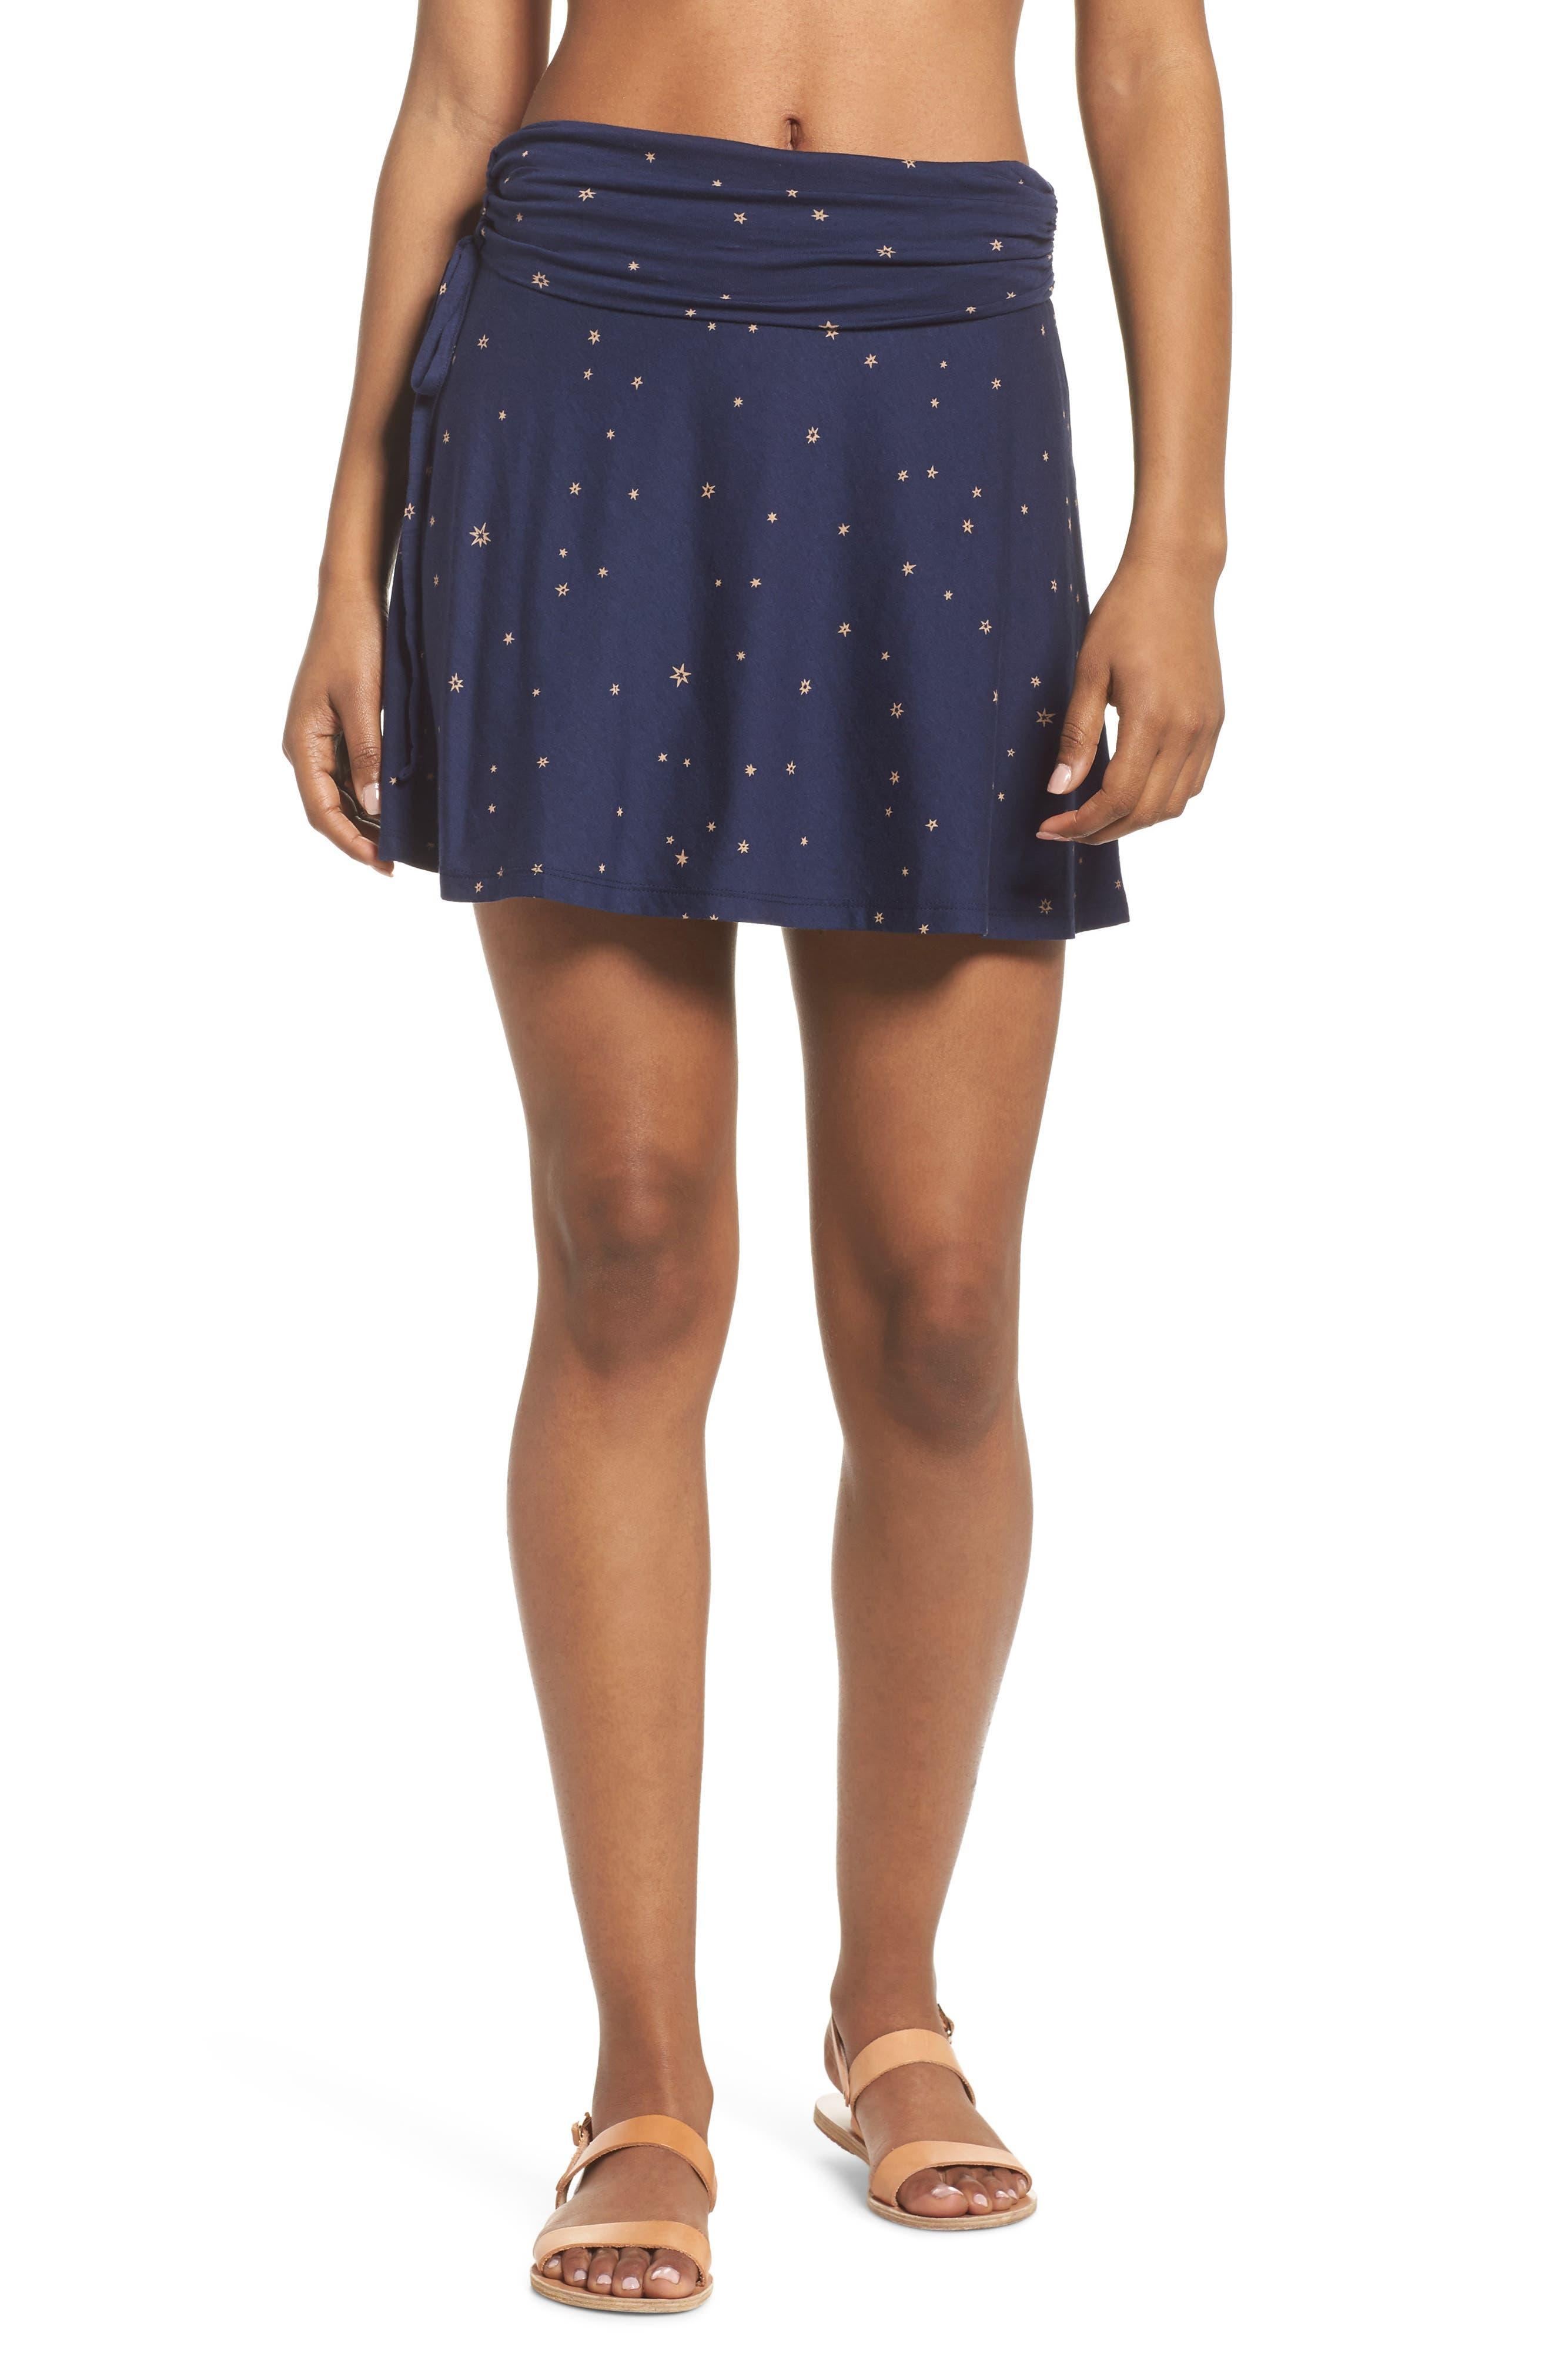 Lithia Cotton Blend Skirt,                         Main,                         color, Micr Mica Pop Classic Navy